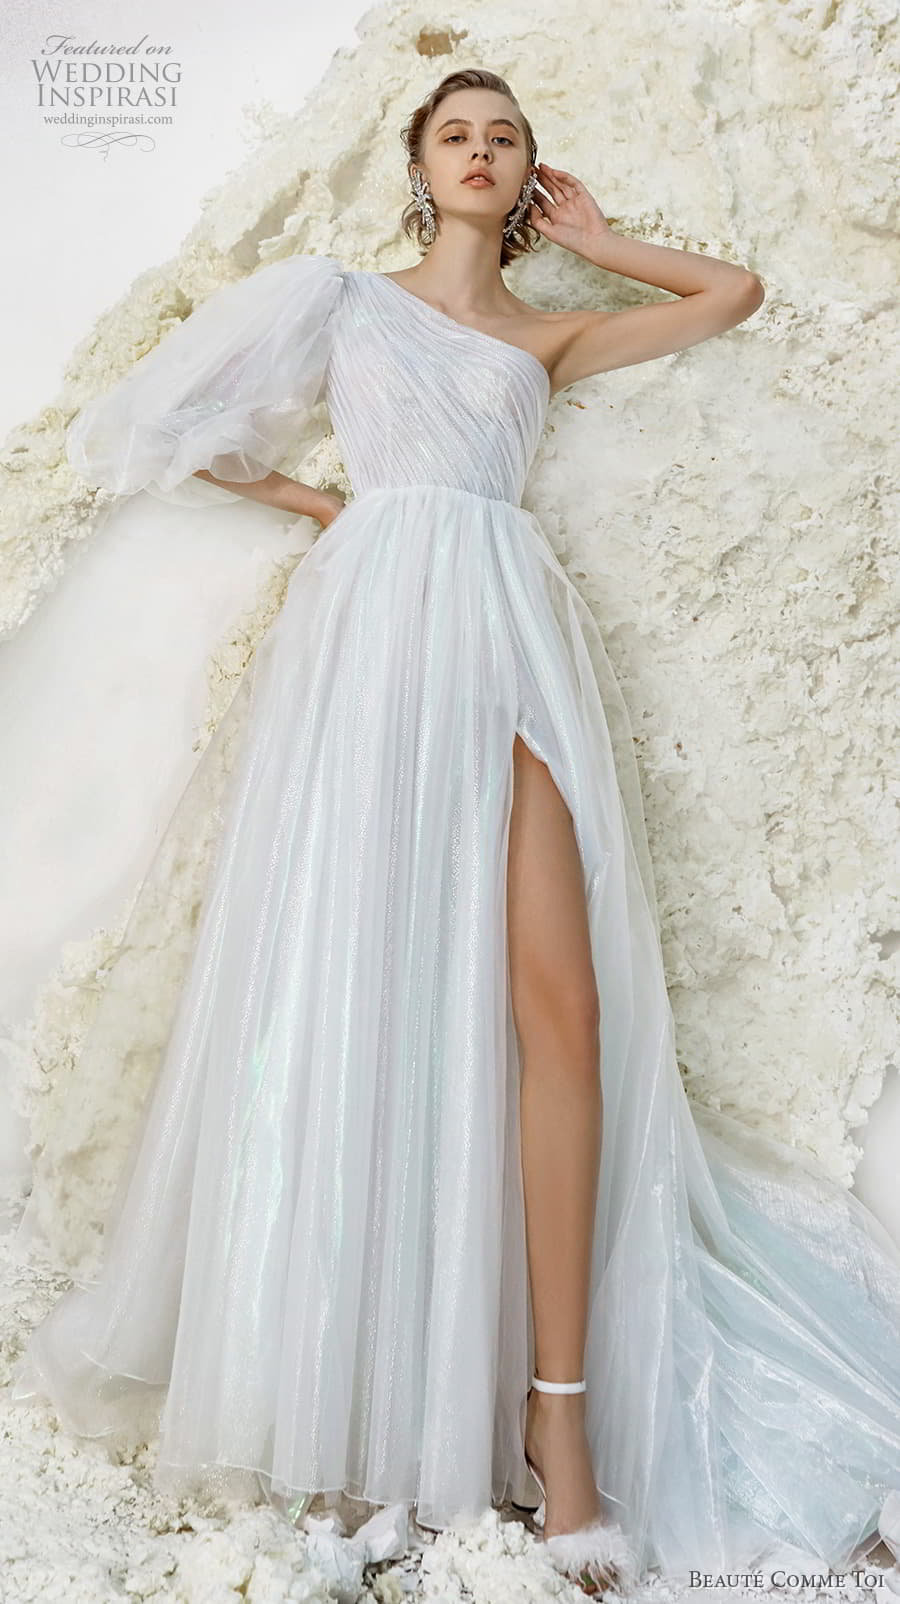 beaute comme toi spring 2022 bridal one shoulder three quarter bishop sleeves ruched bodice glitter elegant a line wedding dress slit skirt chapel train (verna) mv